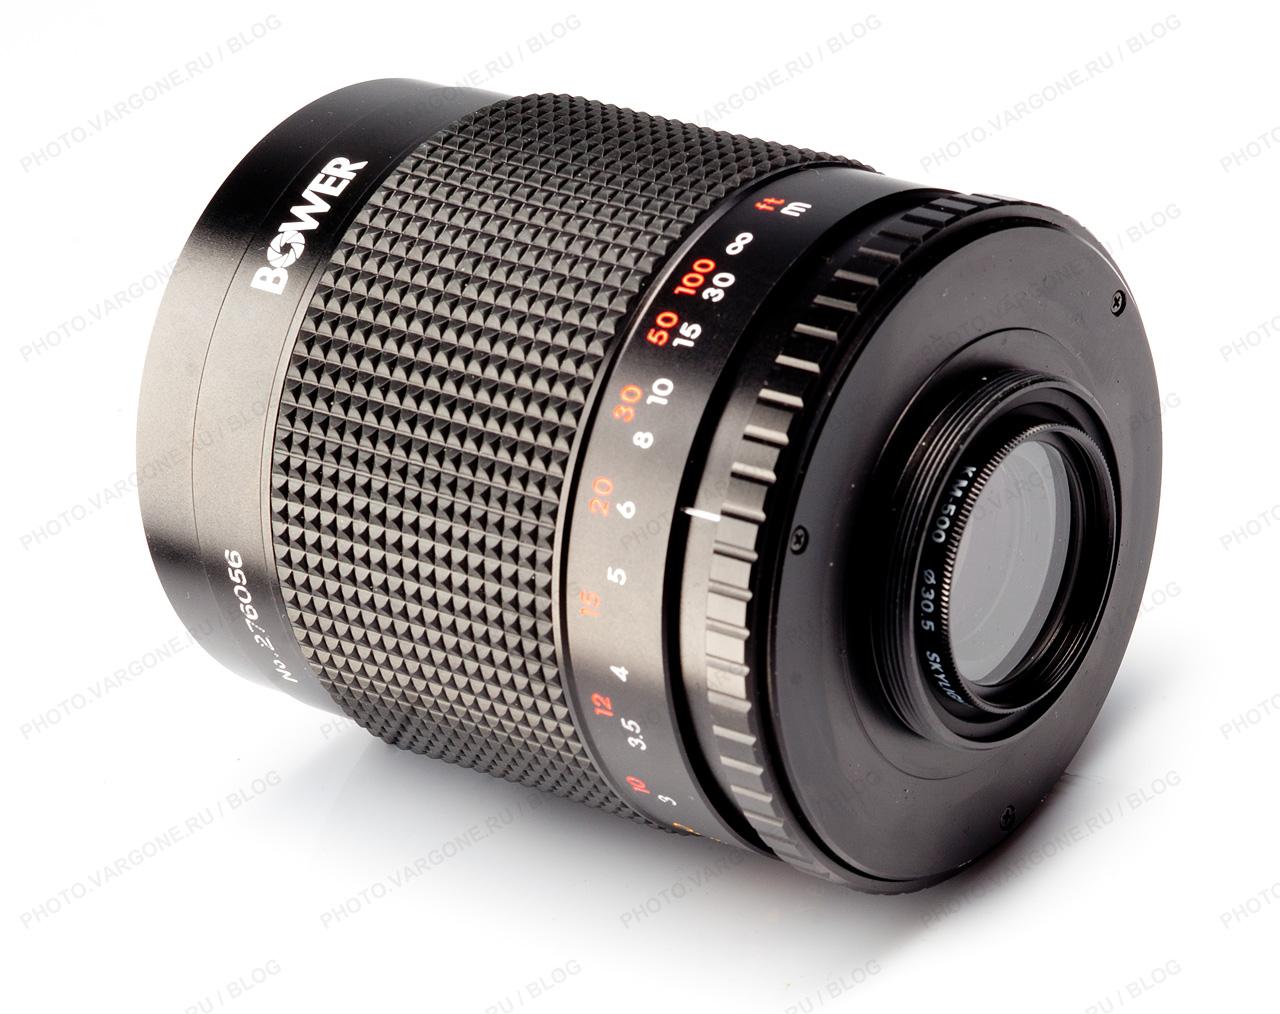 объектив 500mm f/8 0 mirror reflex lens